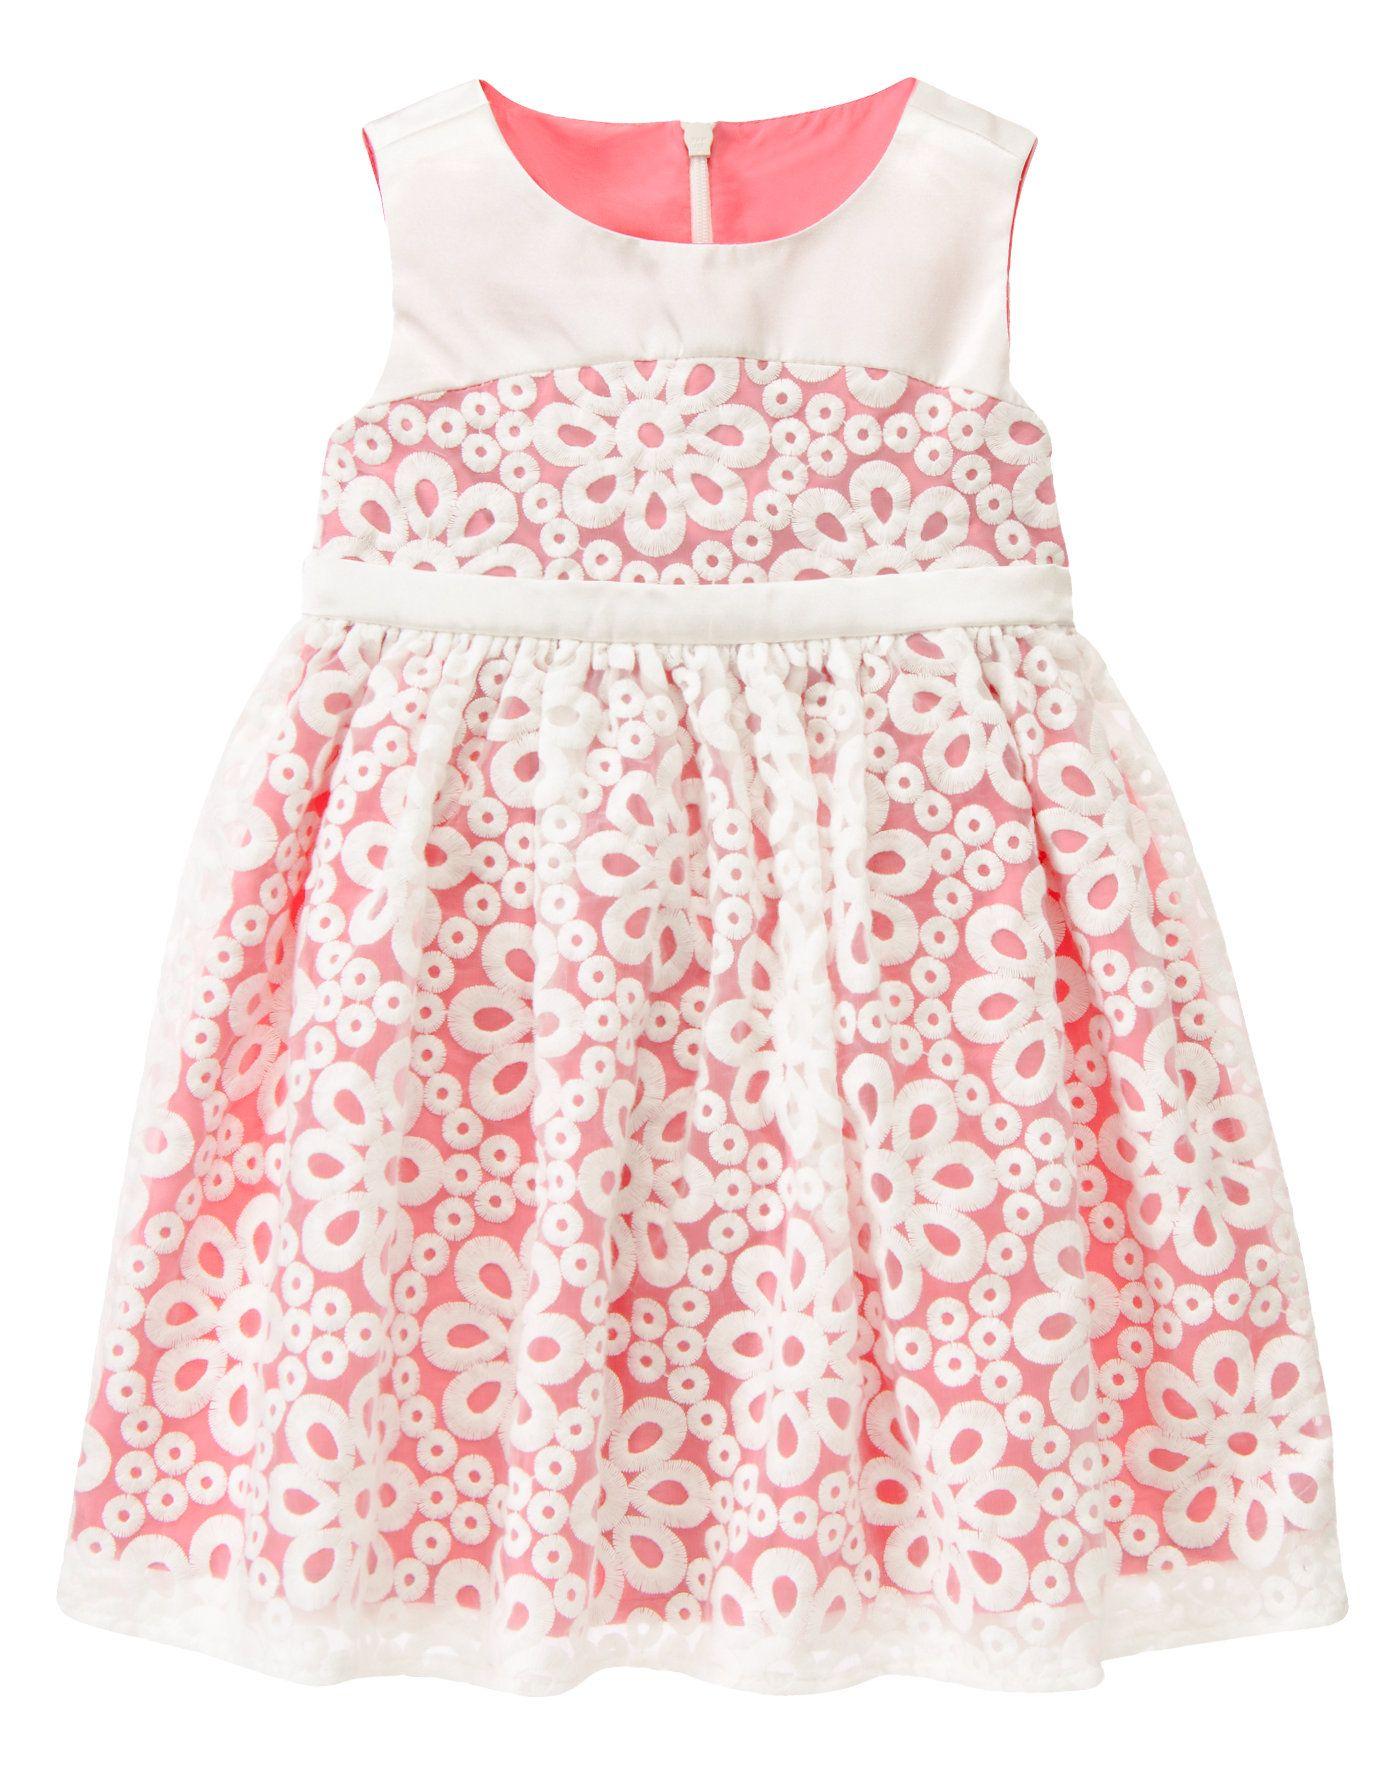 e93777f5d783 Embroidered Organza Dress at Gymboree   Holiday Fun   Organza dress ...